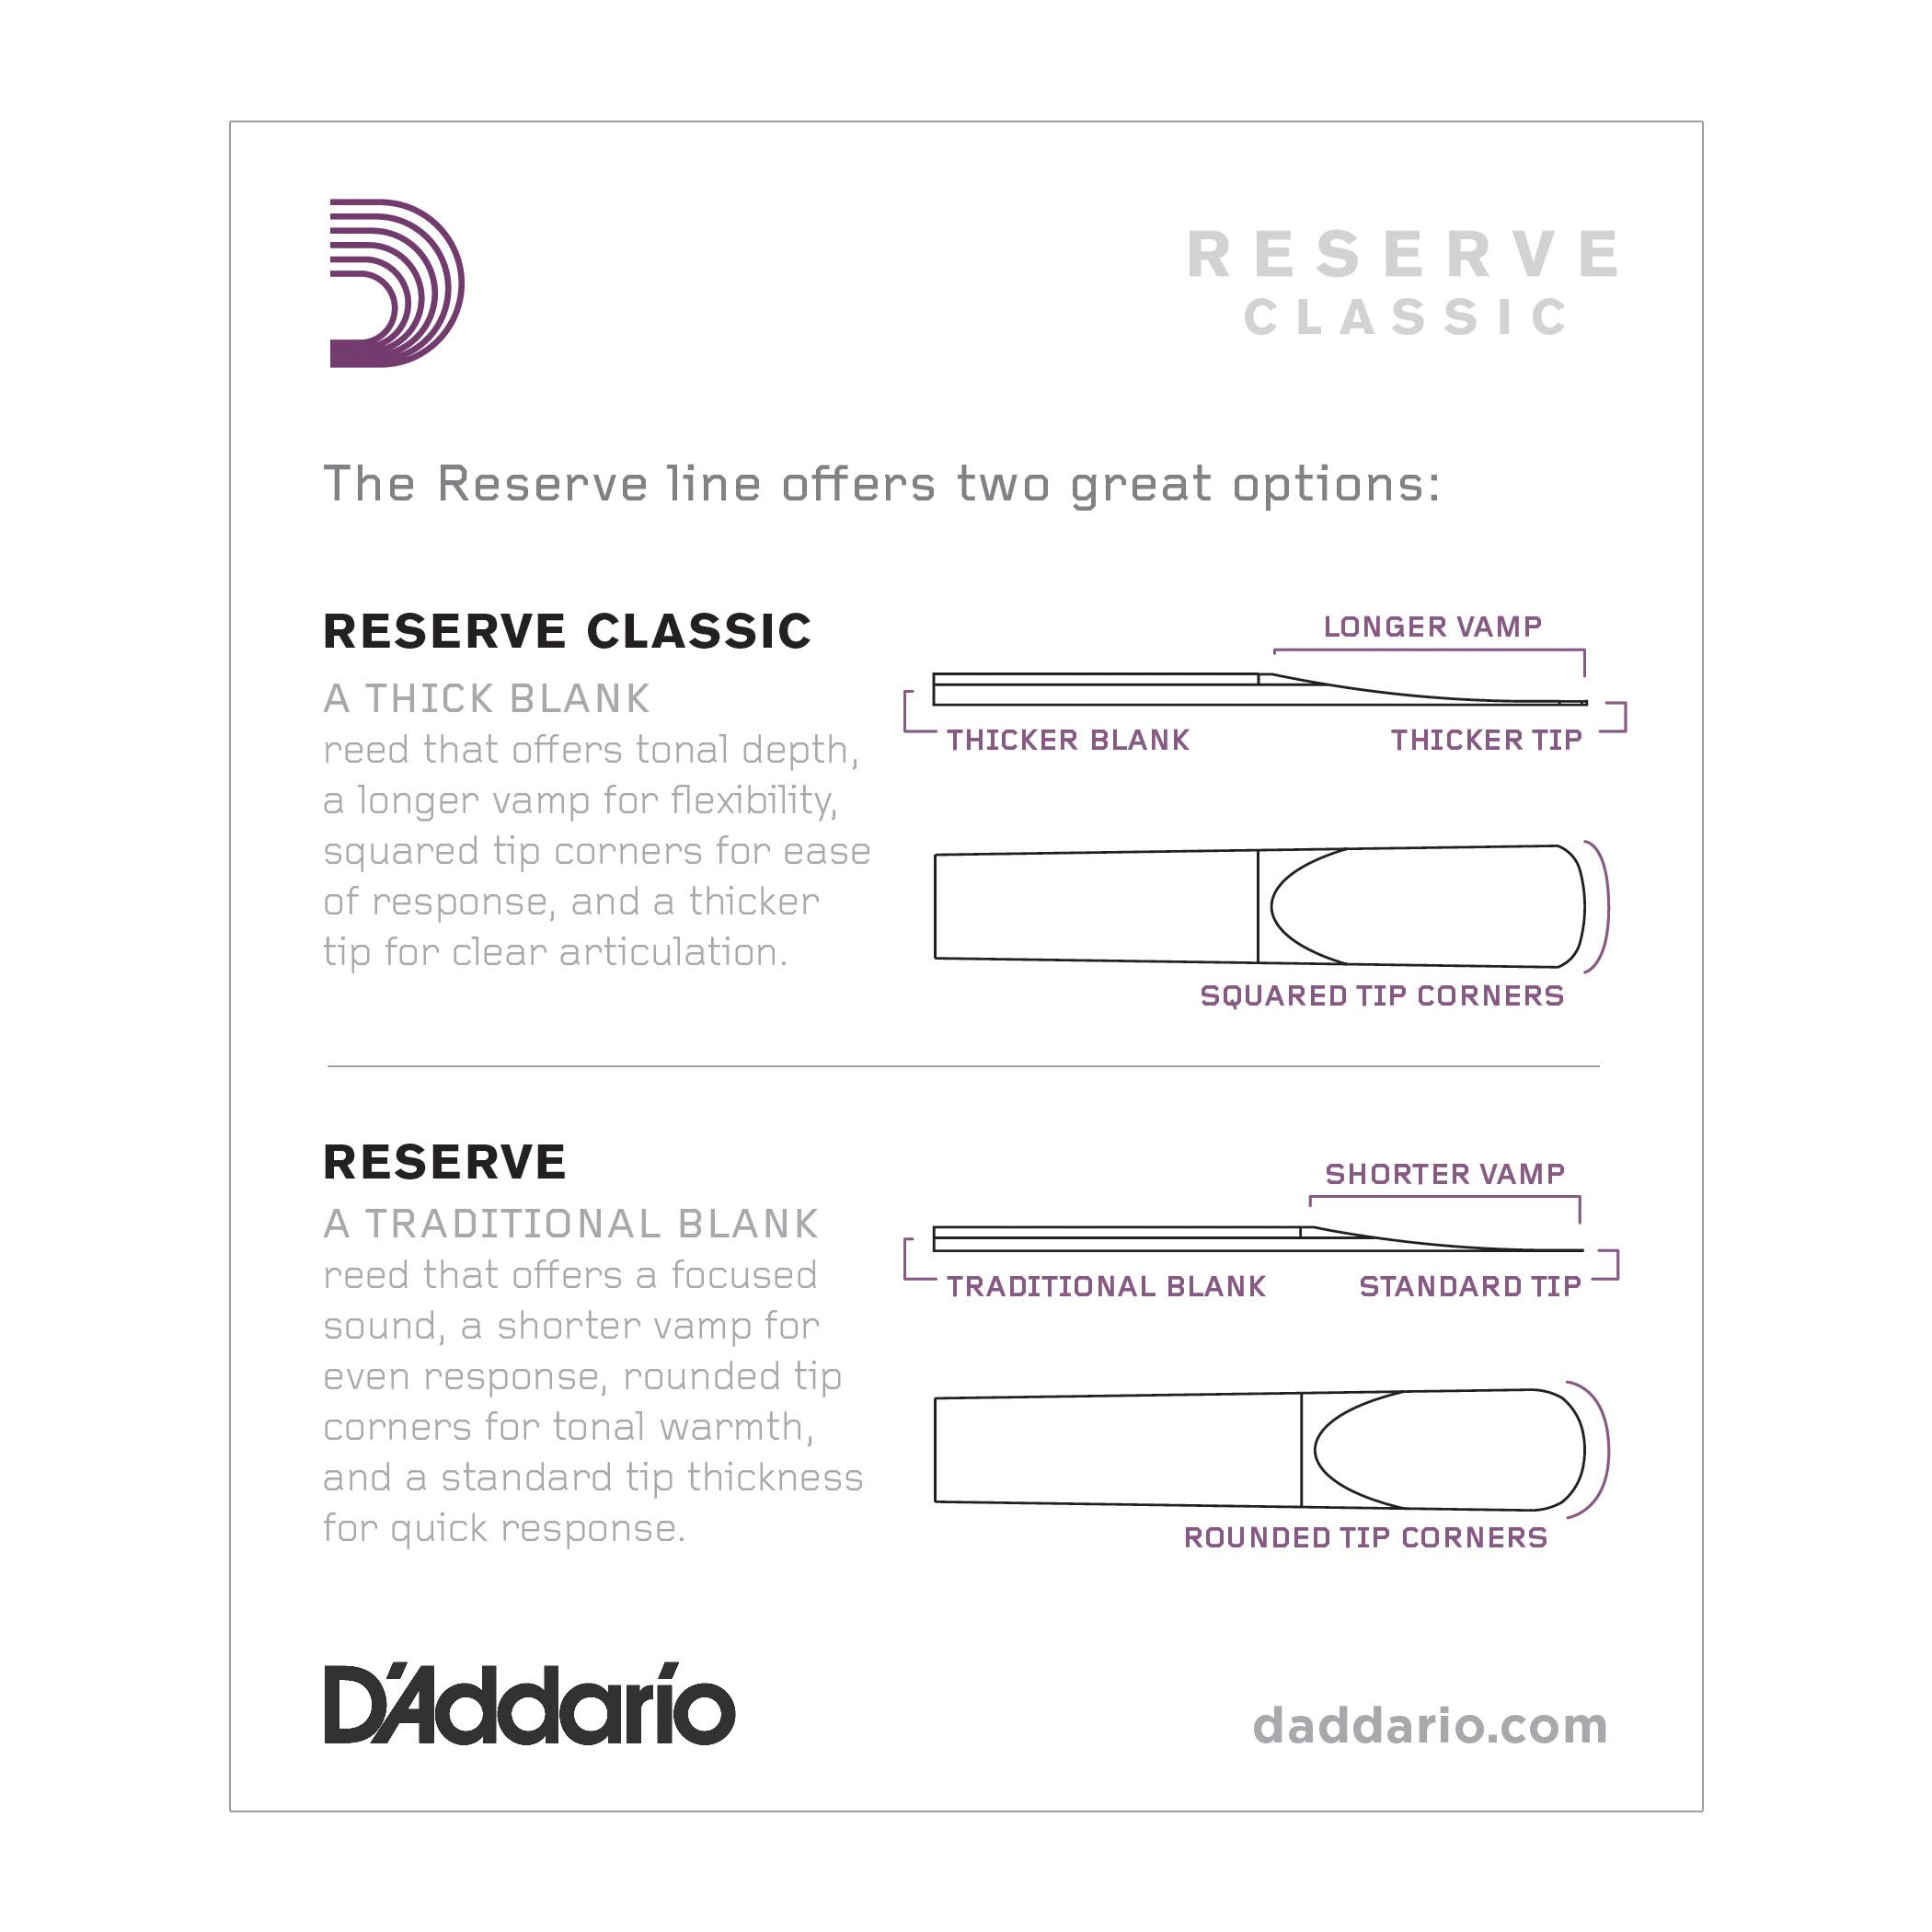 Amazon.com: D'Addario Reserve Classic Bb Clarinet Reeds, Strength ...